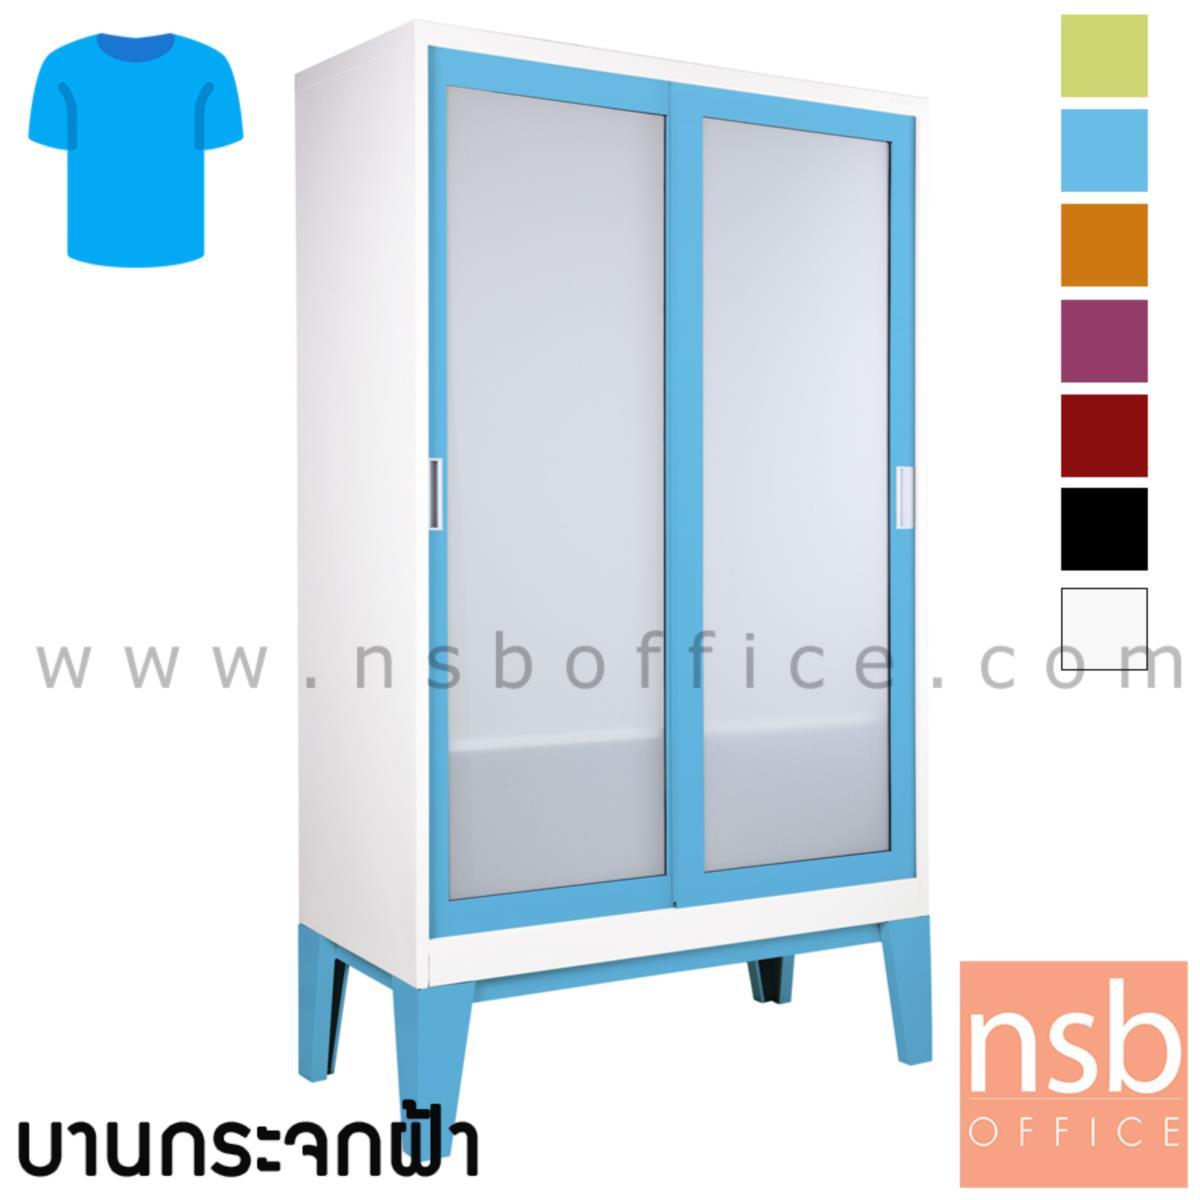 E25A018:ตู้เสื้อผ้า 2 บานเลื่อนกระจกสูง 200H cm. ขาลอย รุ่น WD-05